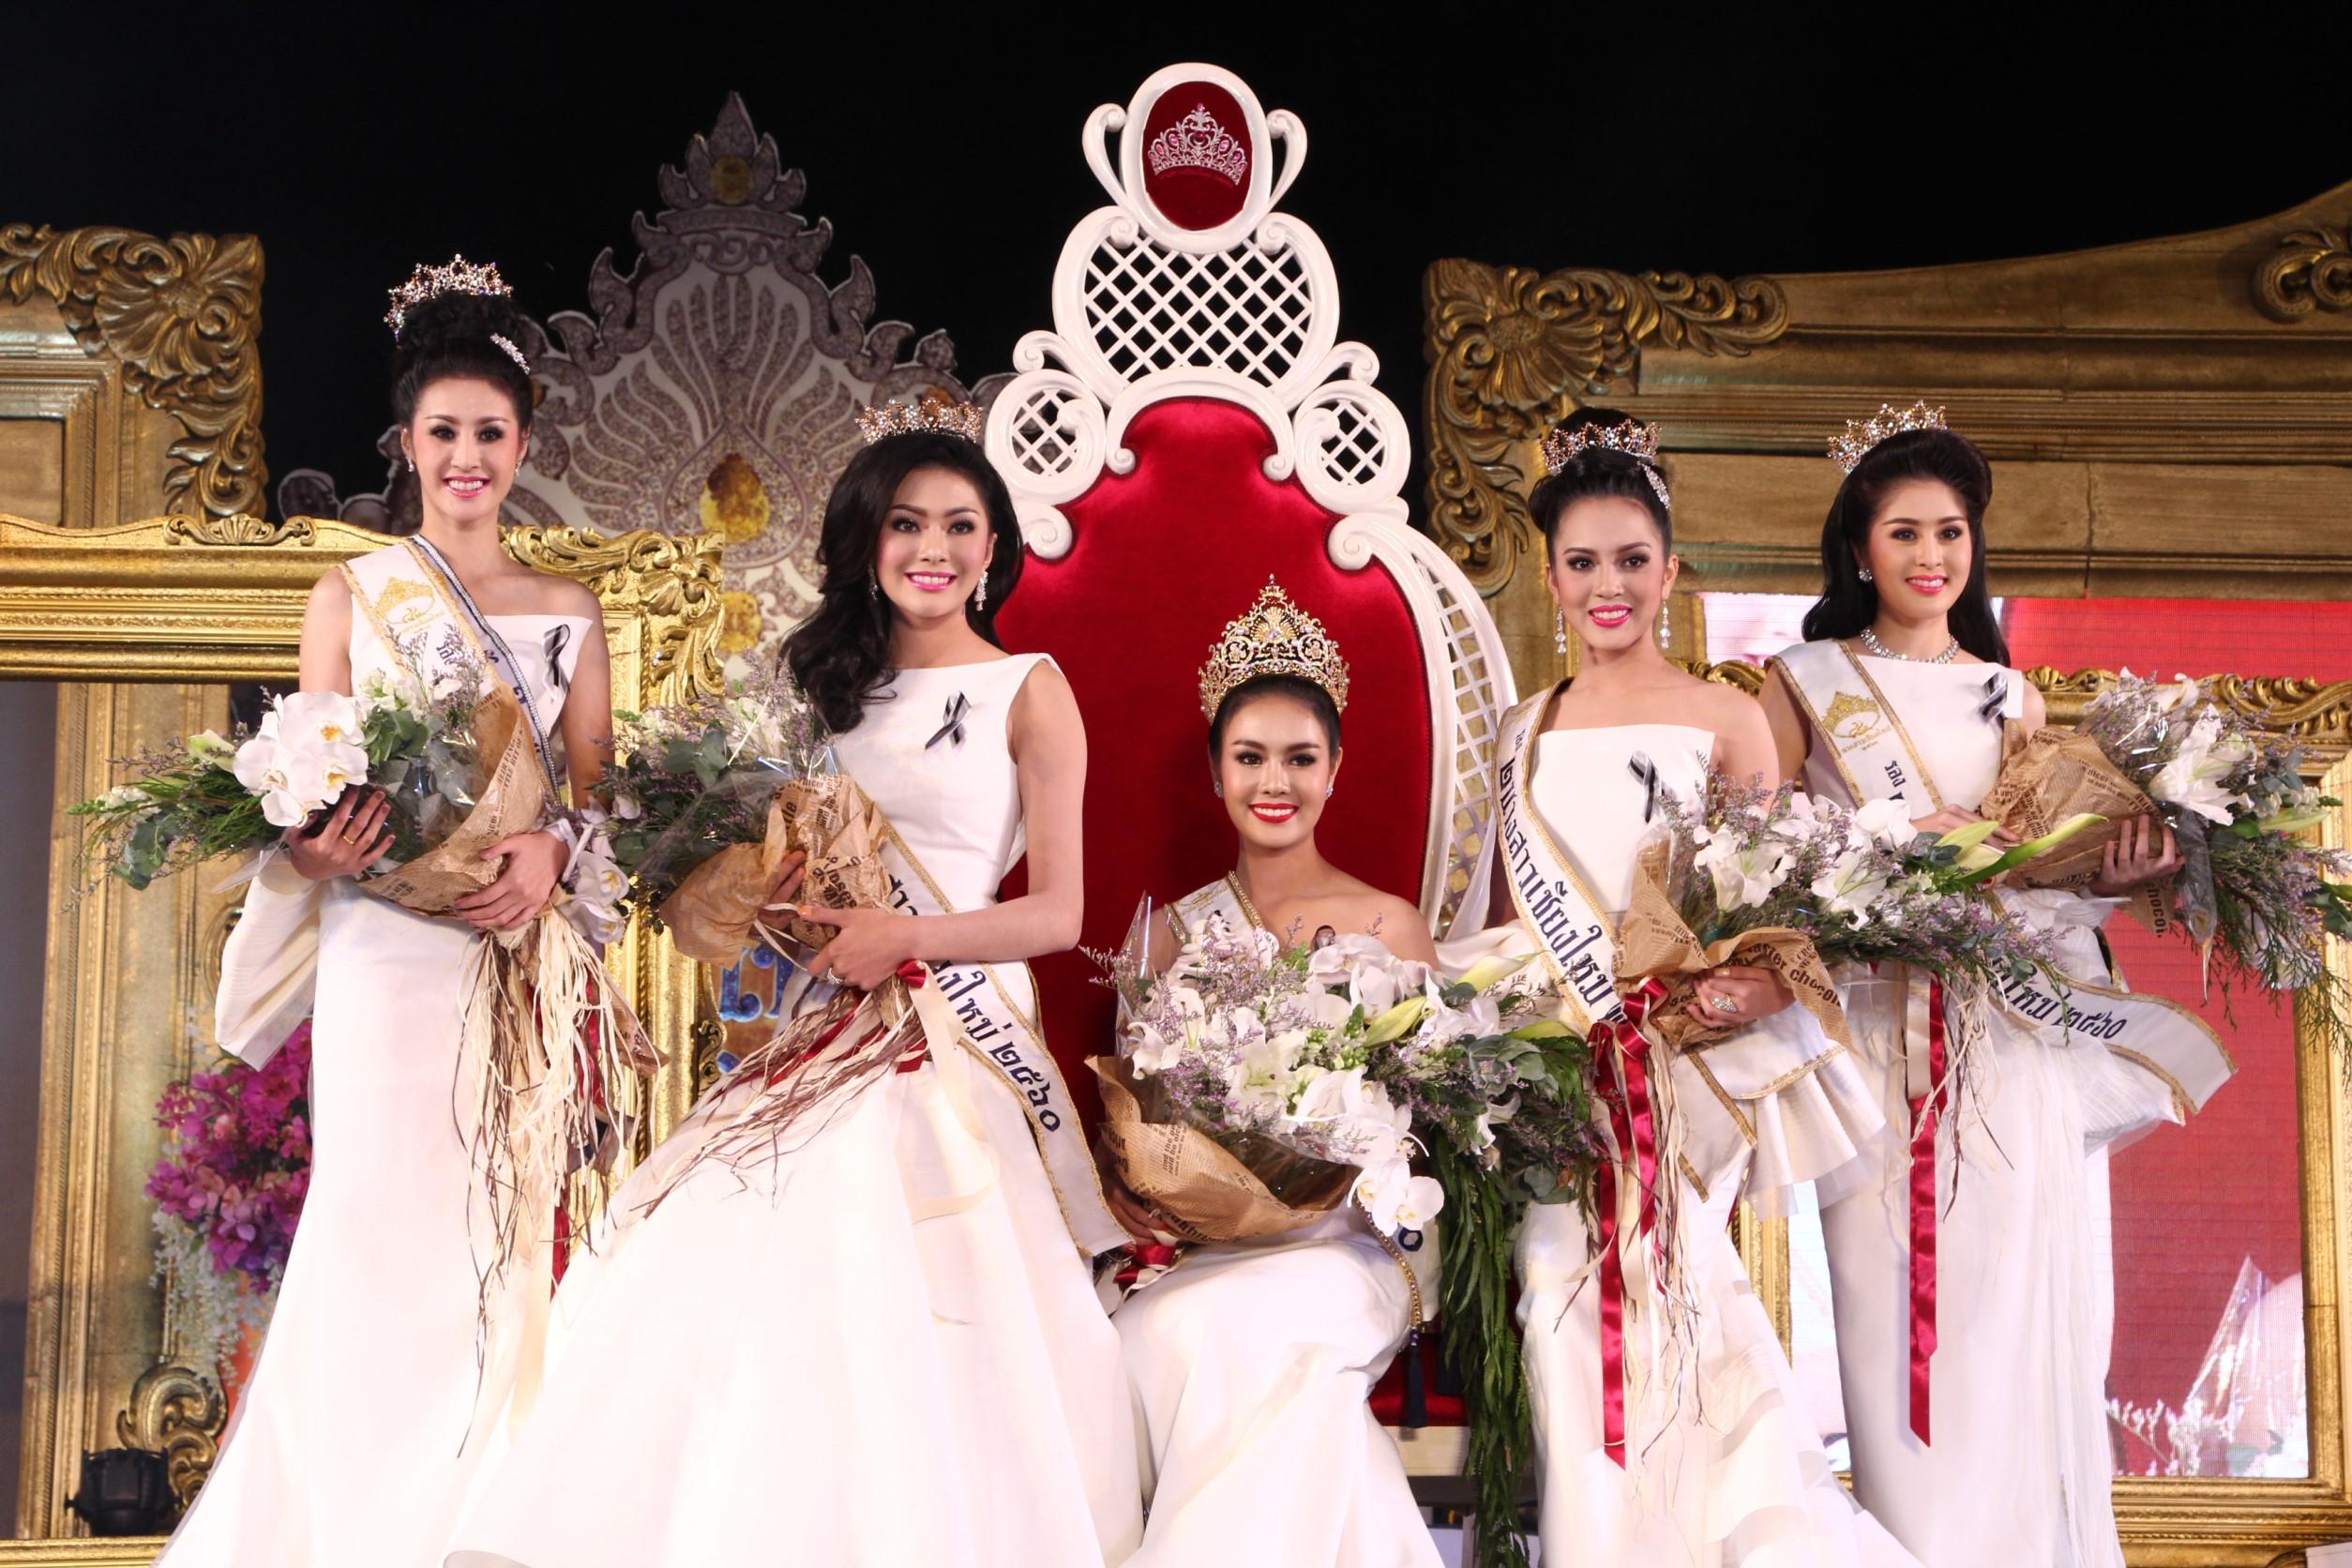 Miss Chiang Mai 2017 Supaporn Ritthipruk and her court with first runner up and runners up Prapasiri Intarungsri, Walulee Duangwana, Pijika Kongsatan, and Chayanith Tor Charoen.